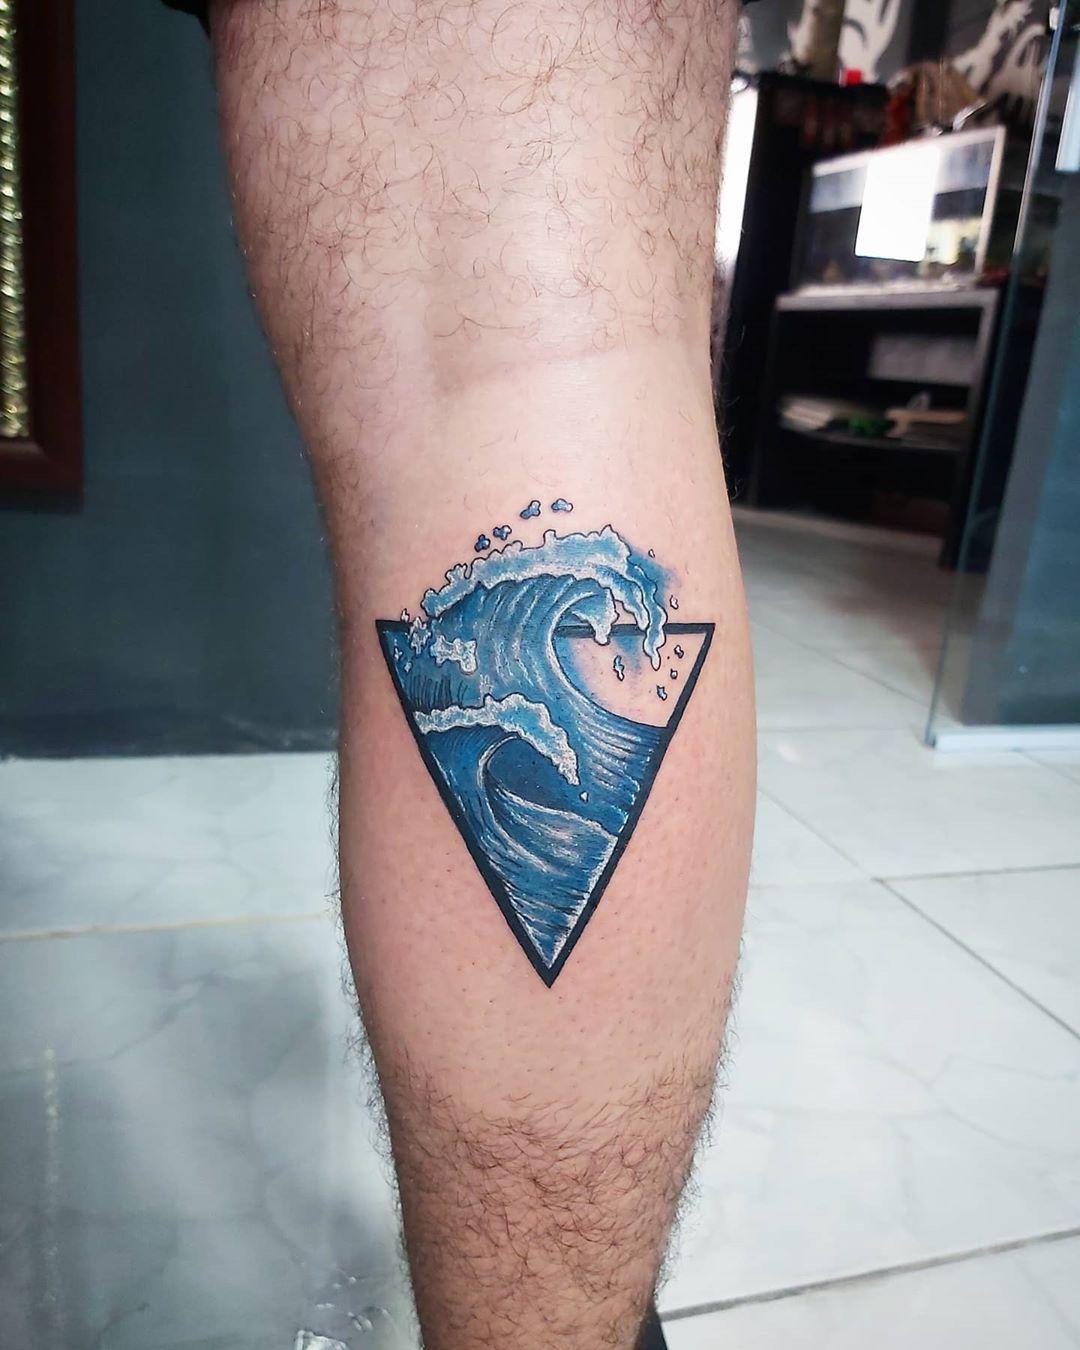 Dúvidas e orçamento chama 1198388-3714 #artnapele #estilodevida #tattooonda #tattoocolirida #art #sptattoo #tattoowork #tattoowolf #tattooworld #worldtattoo #tattoo #sptattoo